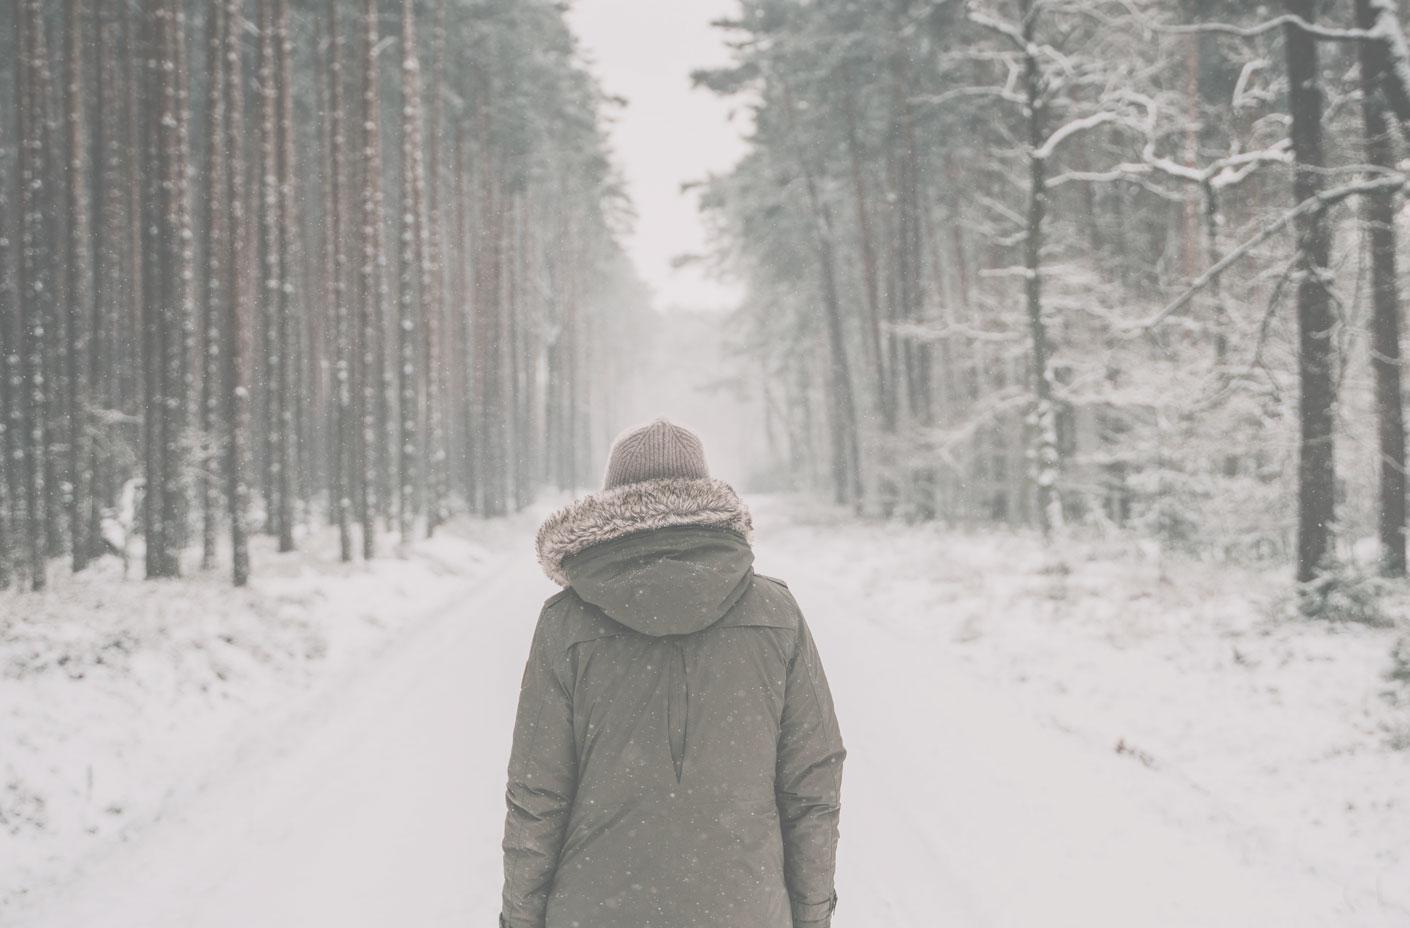 Man på snöig skogsväg